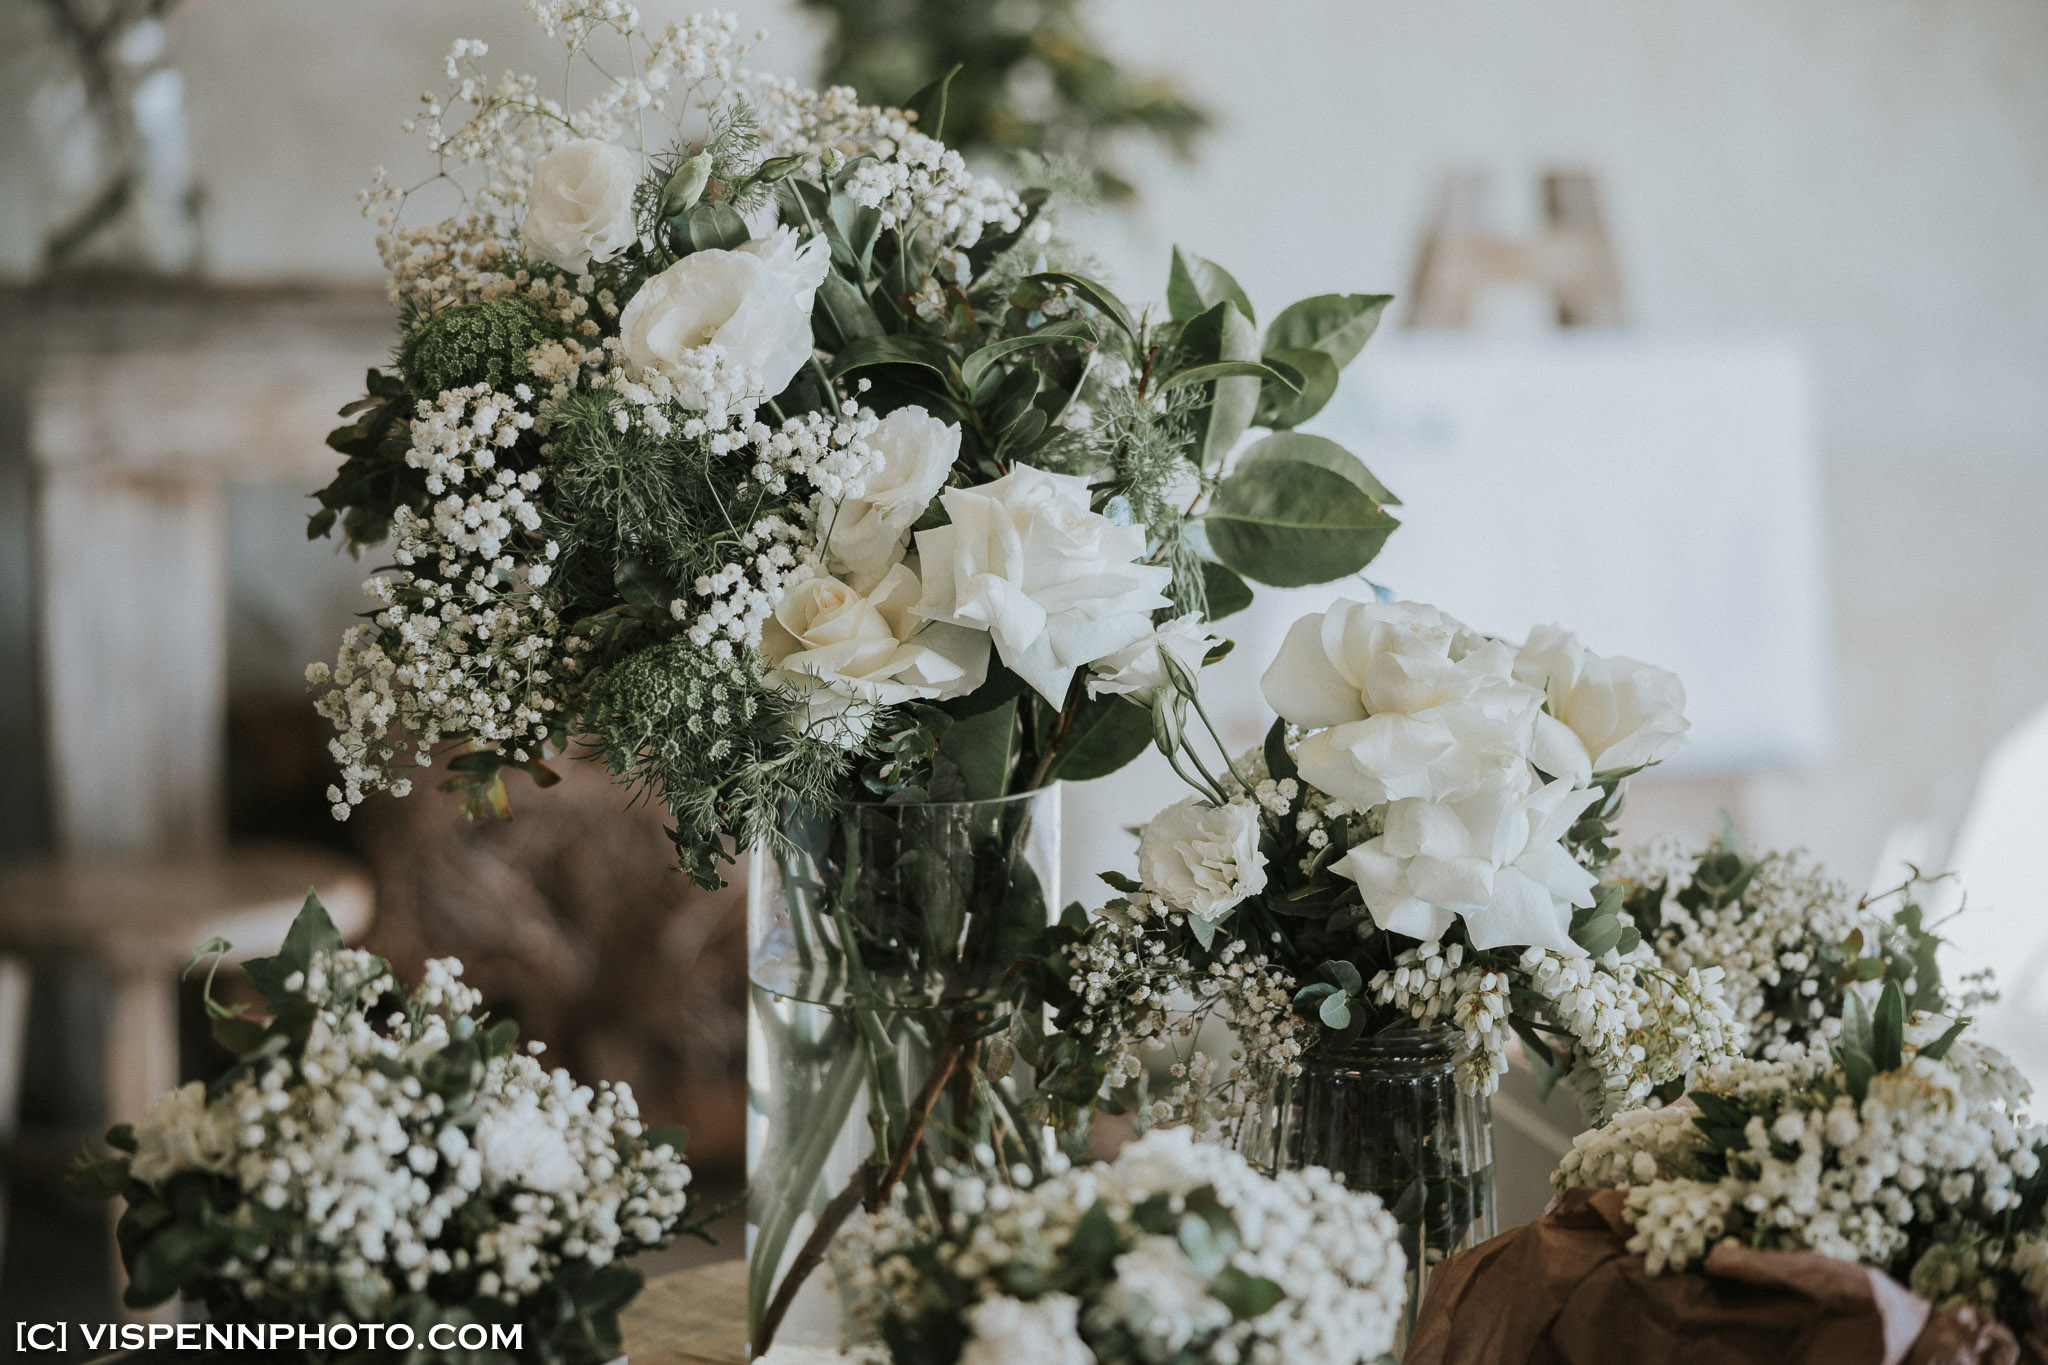 WEDDING DAY Photography Melbourne LeanneWesley 01261 1P EOSR ZHPENN